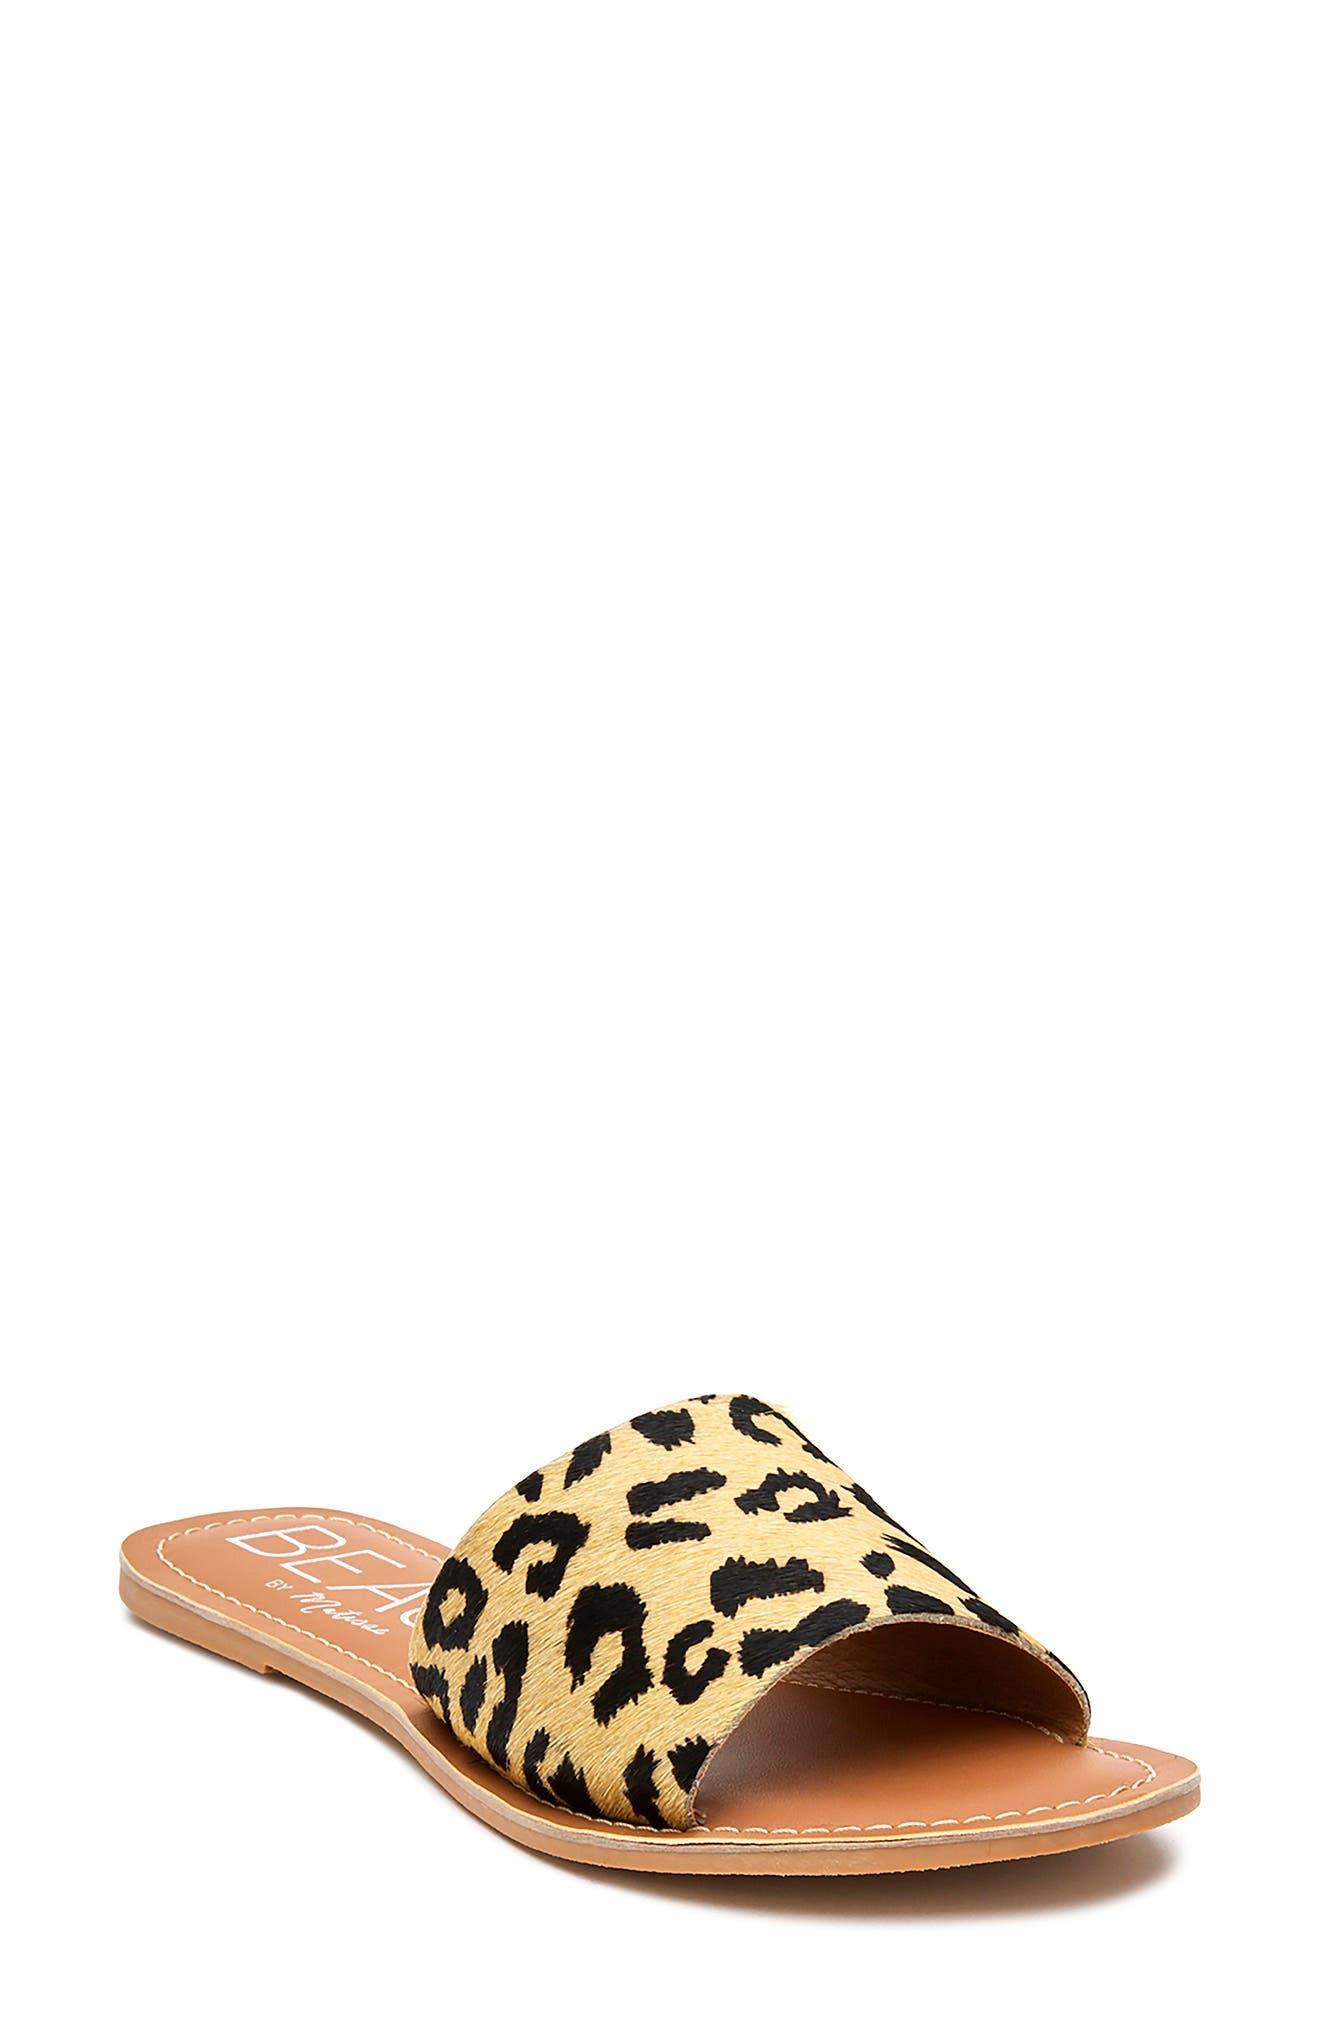 Women's Coconuts By Matisse Cabana Genuine Calf Hair Slide Sandal